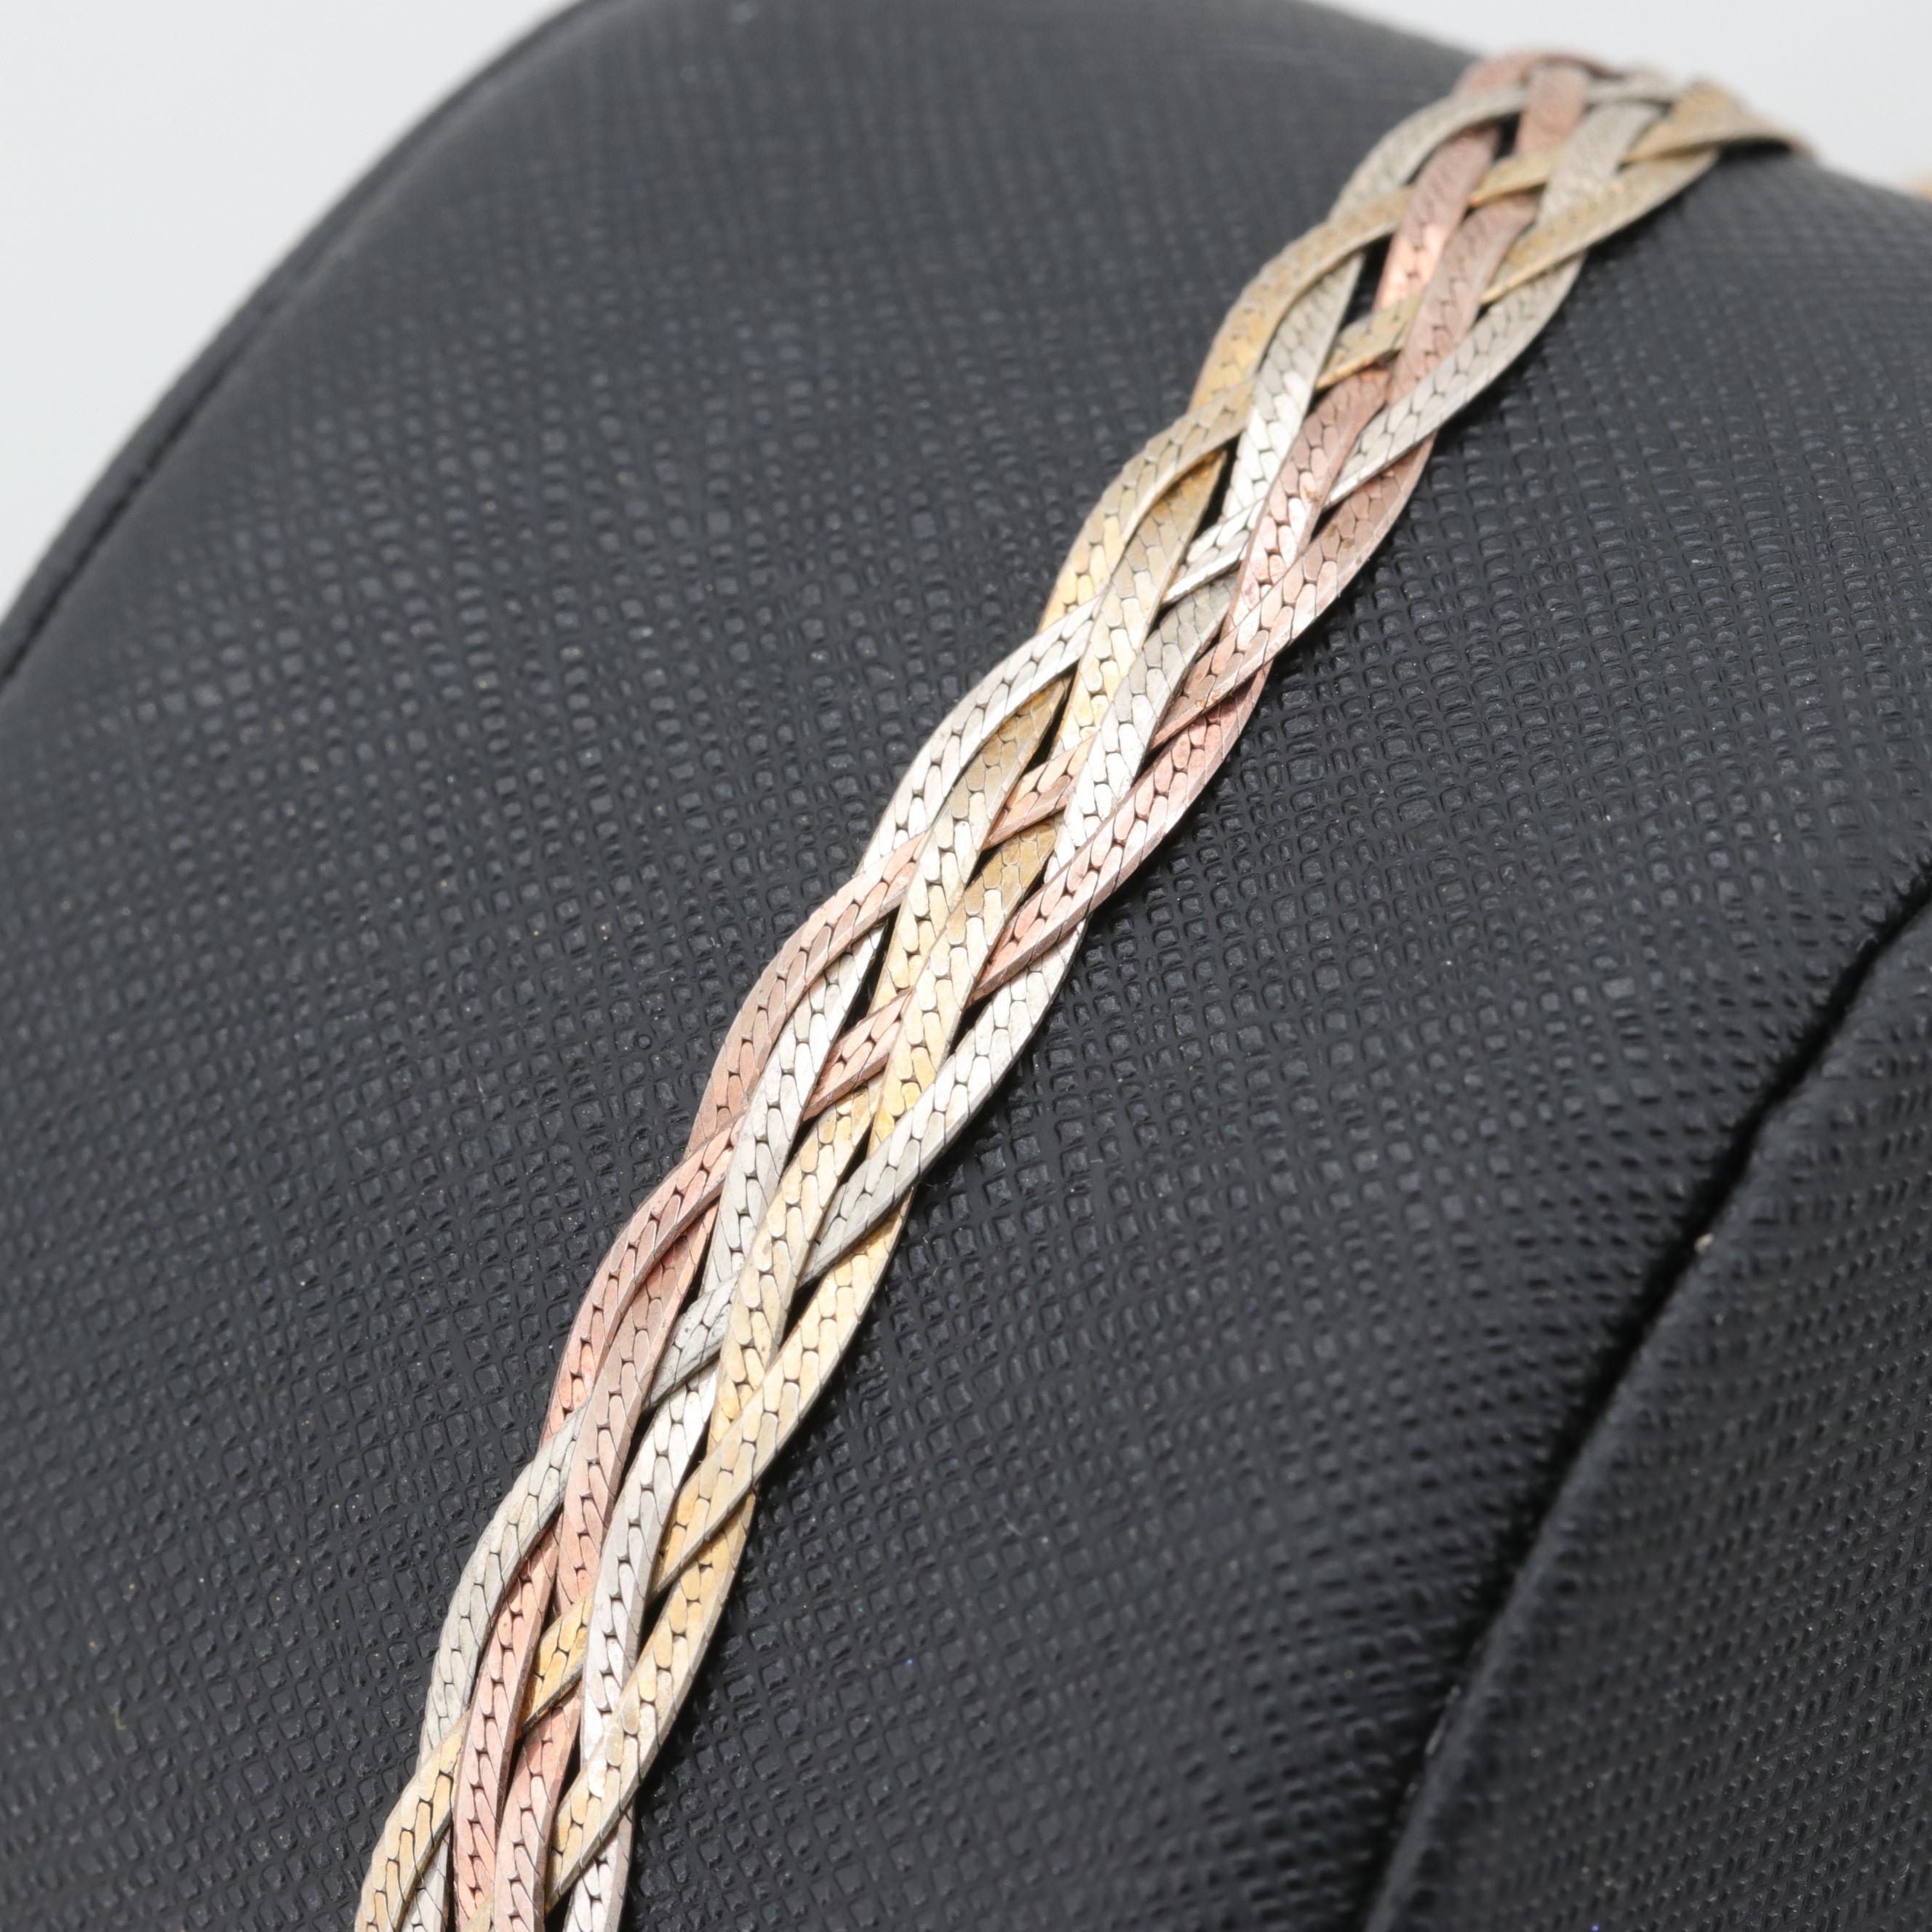 Tricolor Sterling Silver Braided Bracelet